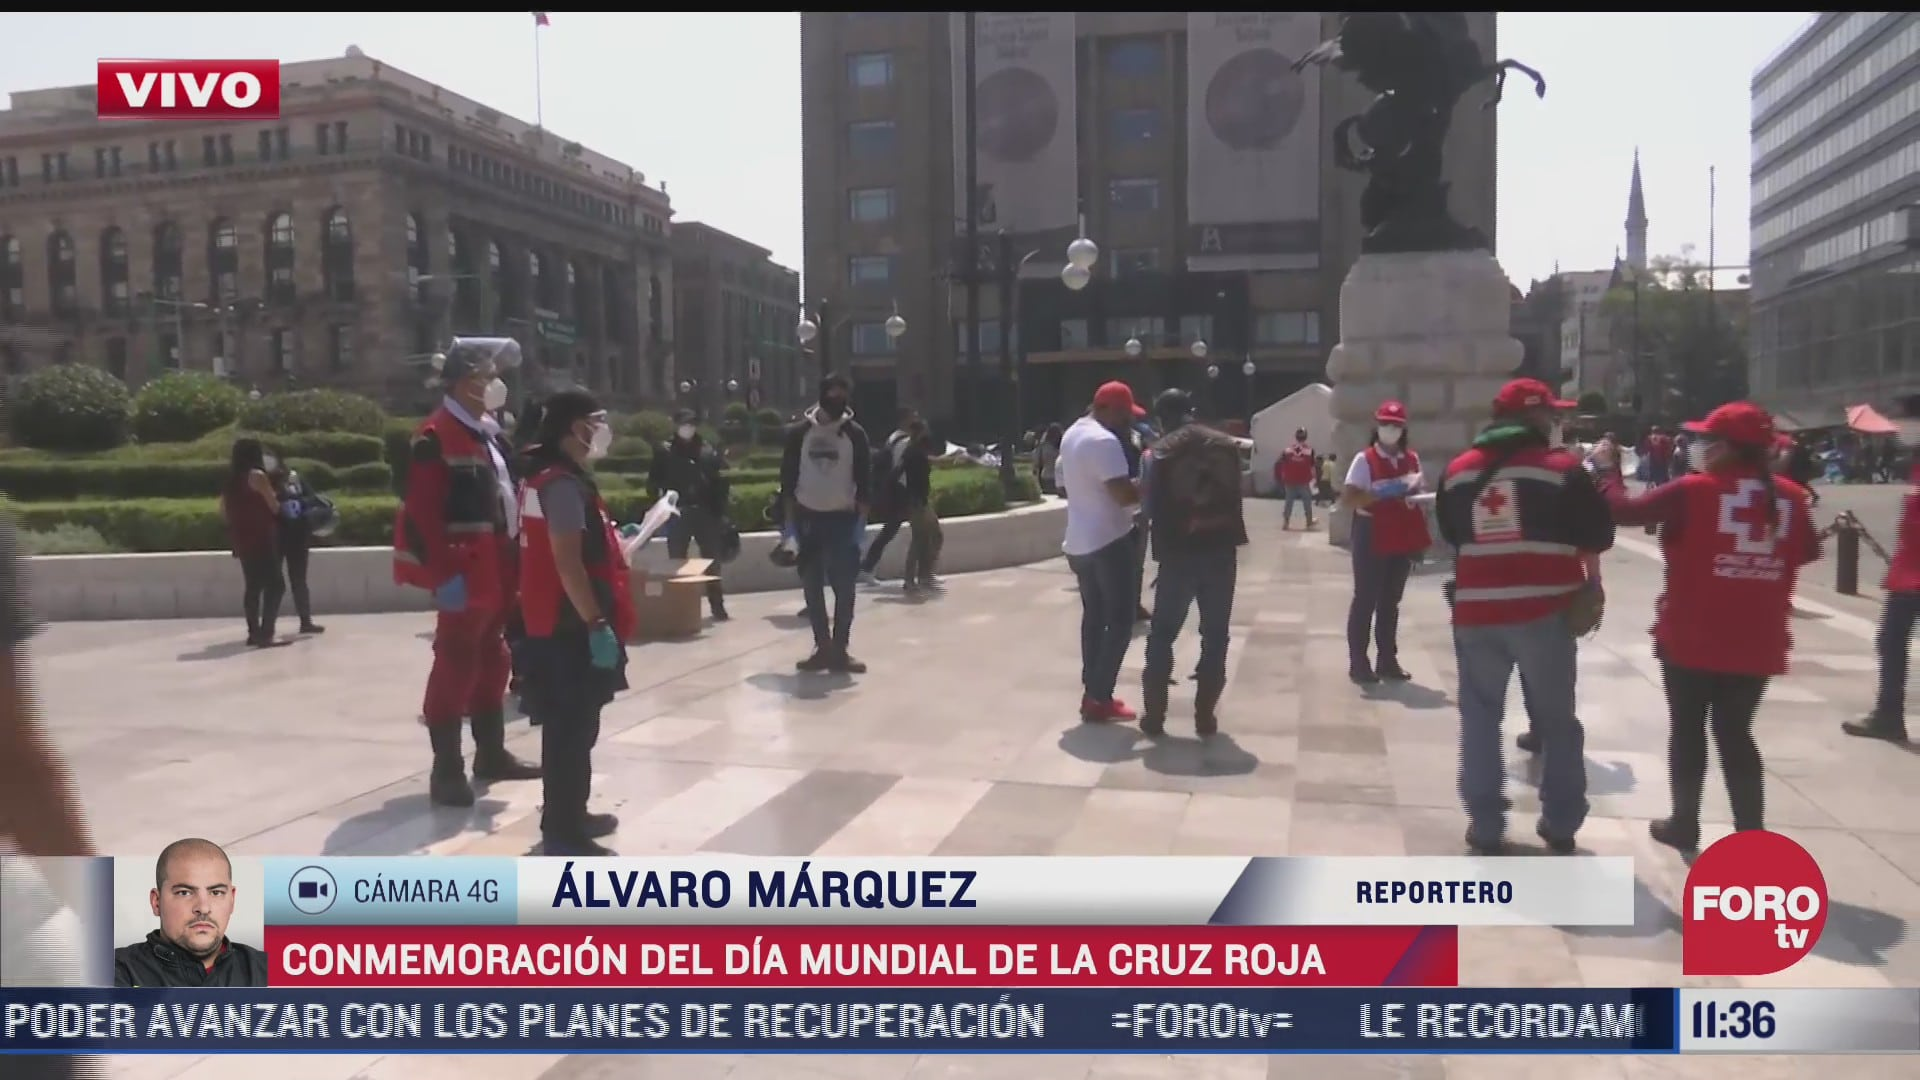 la cruz roja celebra sus 125 anos